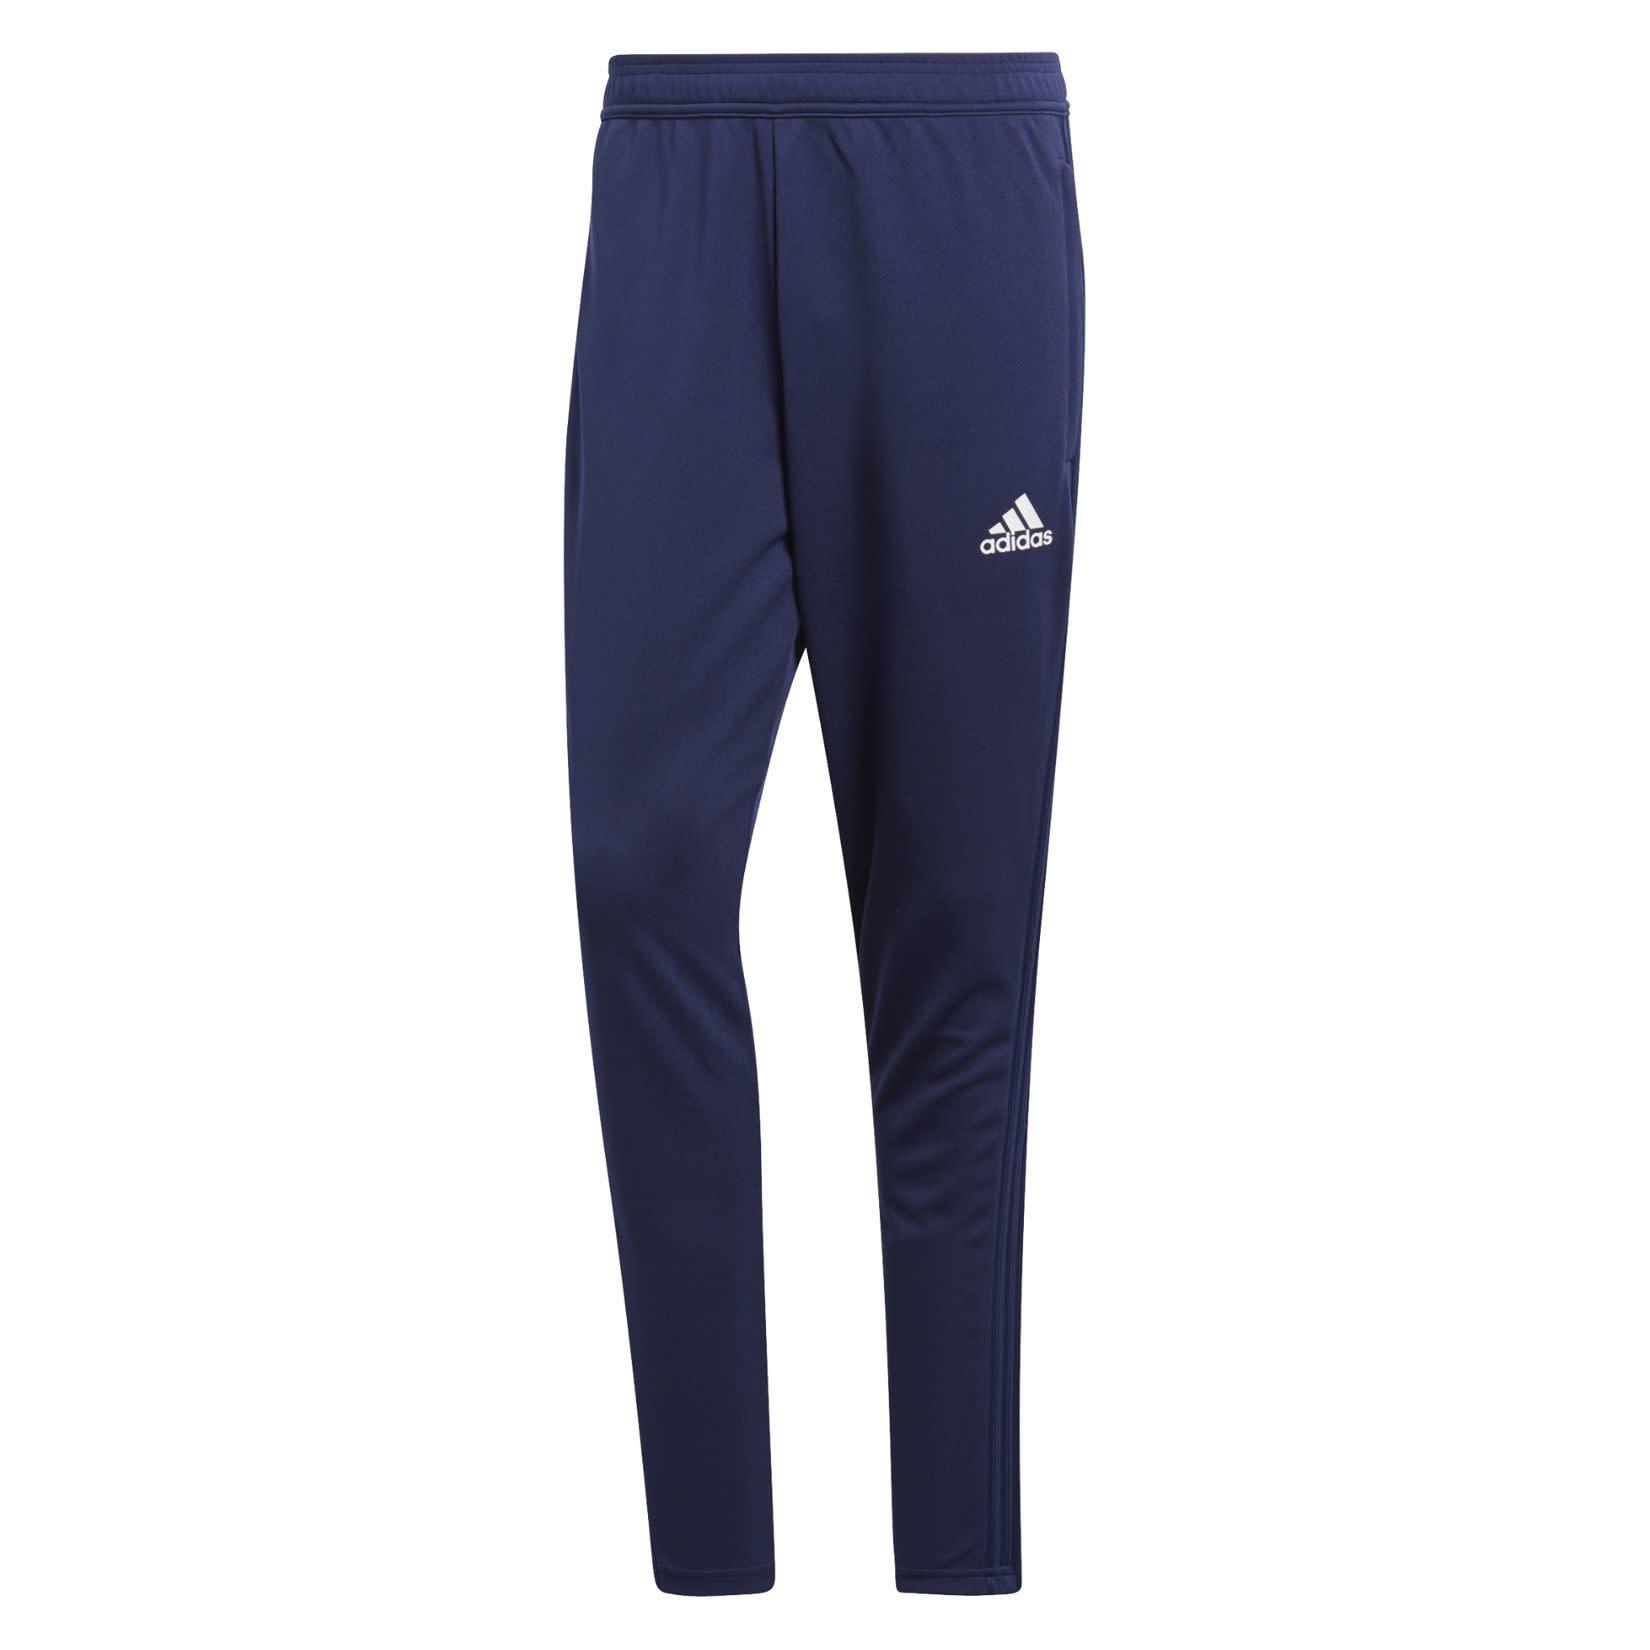 Adidas ADIDAS JR Condivo 18 Training Pant